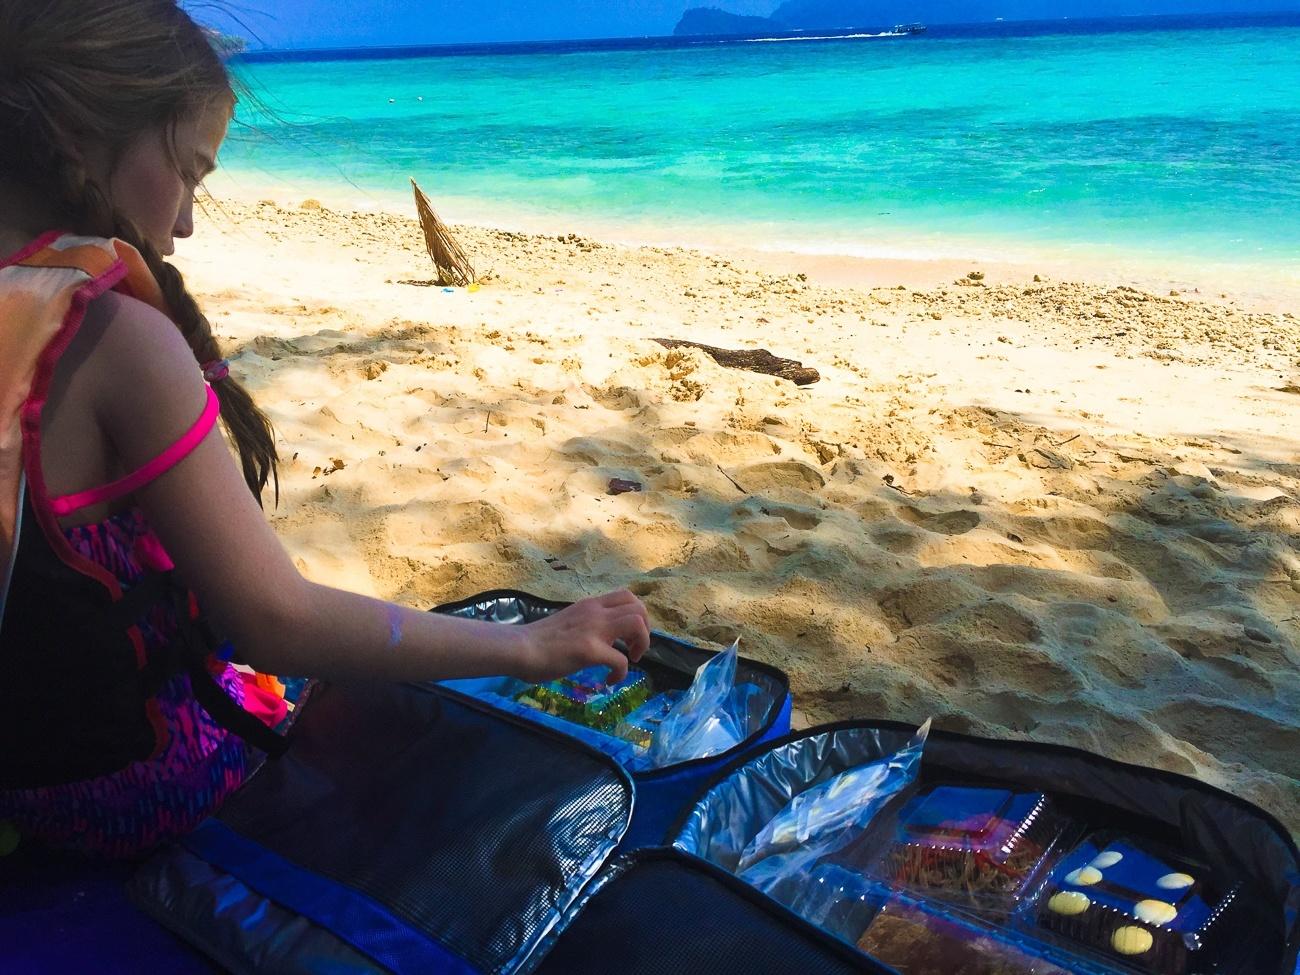 Our picnic lunch on Mamutik Island ordered through Shangri-la's Tanjung Aru